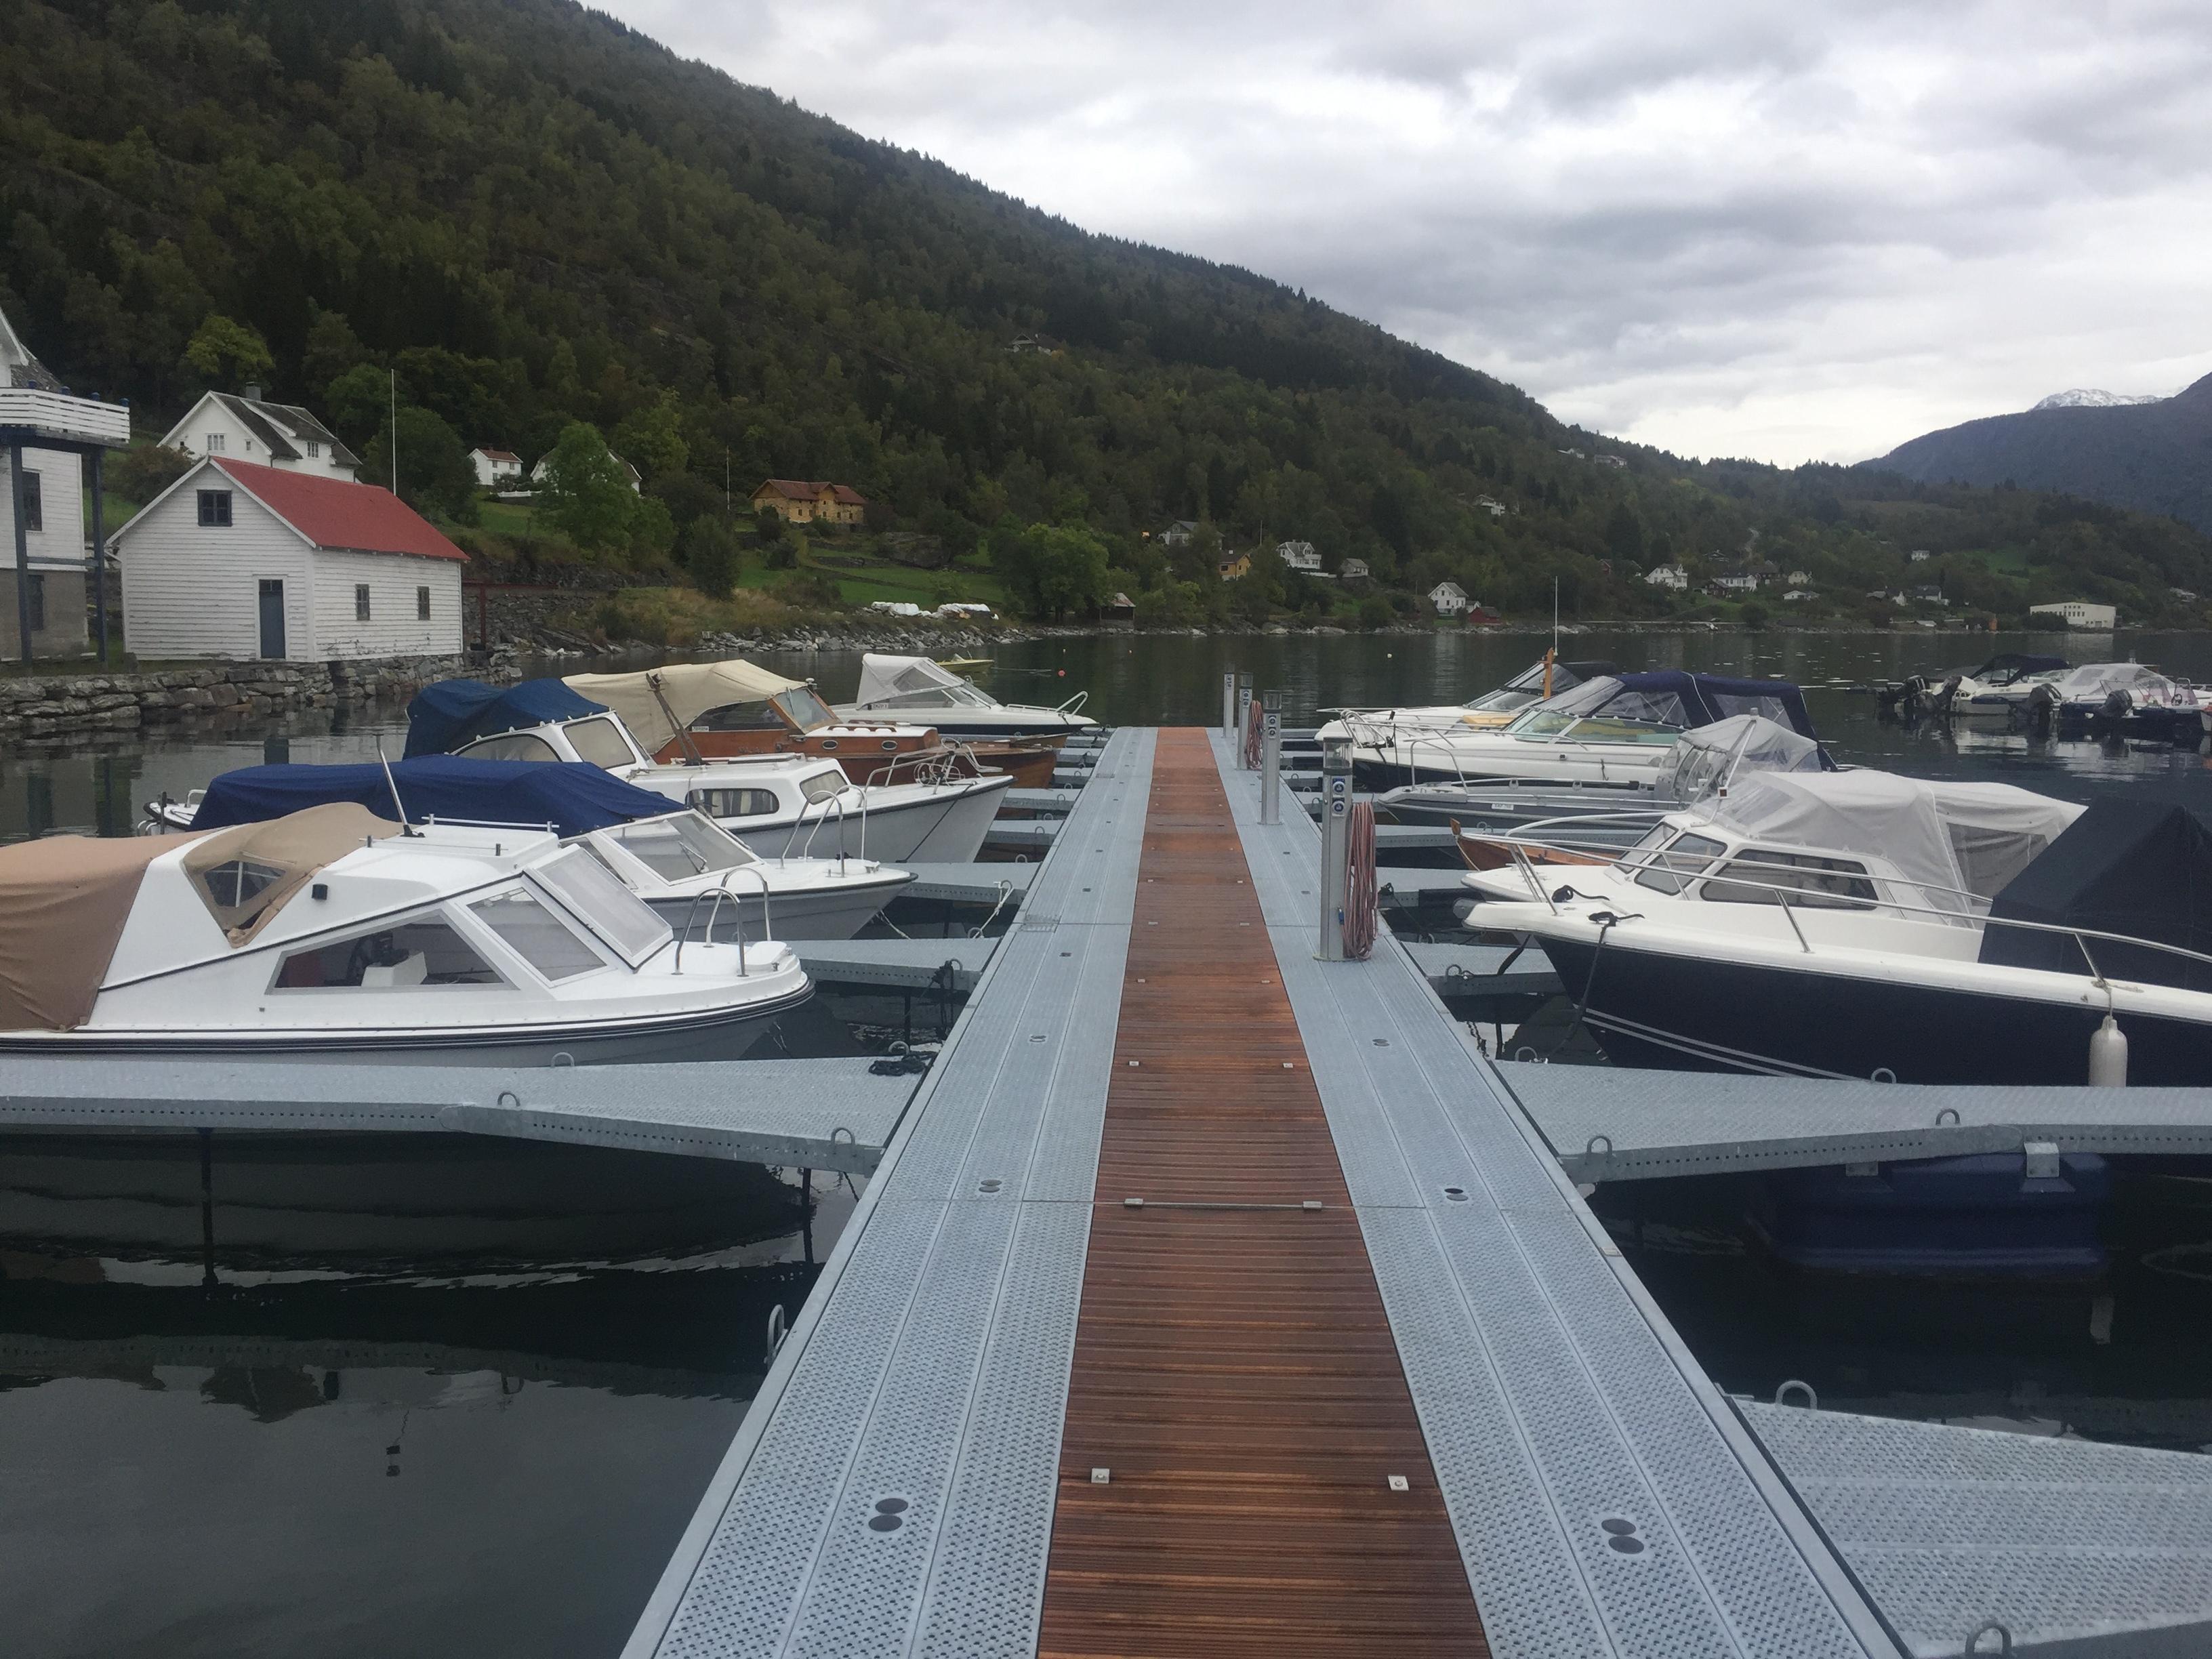 https://marinasolutions.no/uploads/Høyheimsvik-Båtlag_Luster_09-8_2020-12-02-134236.JPG